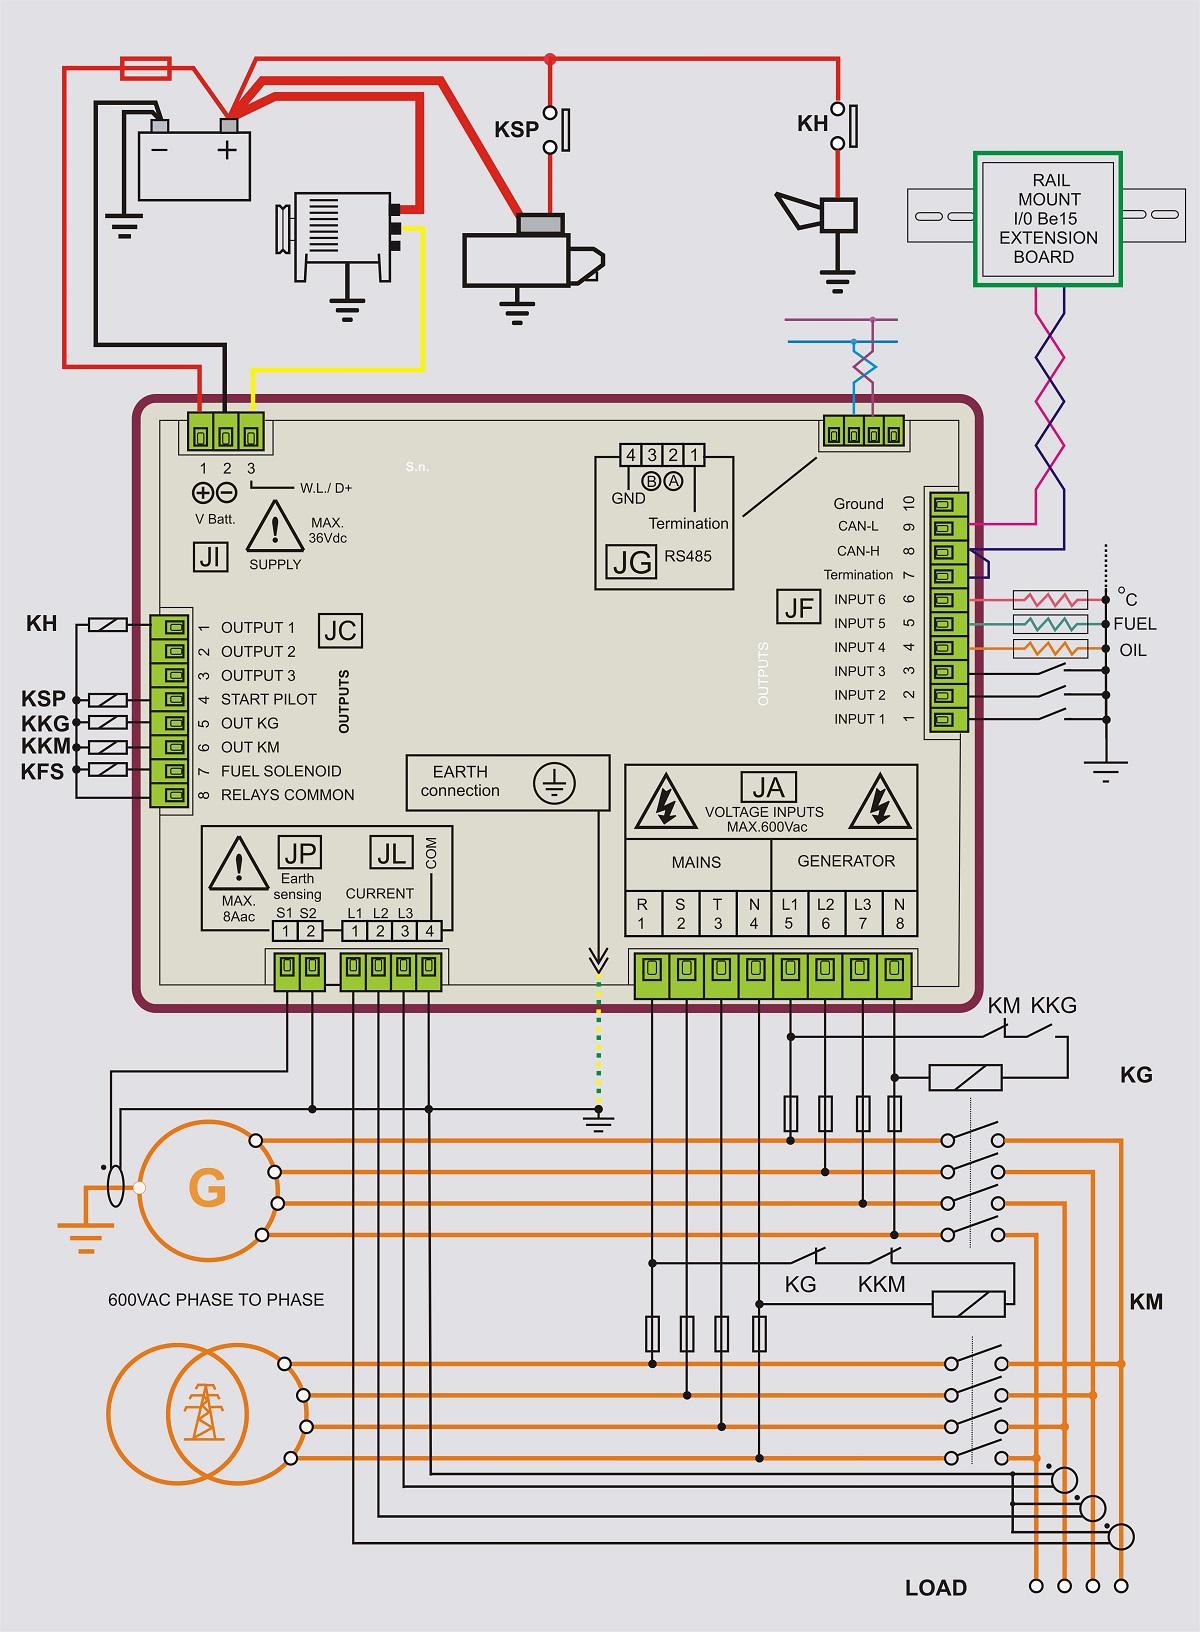 Haynes Ld R Dumpmaster Wiring Diagram on